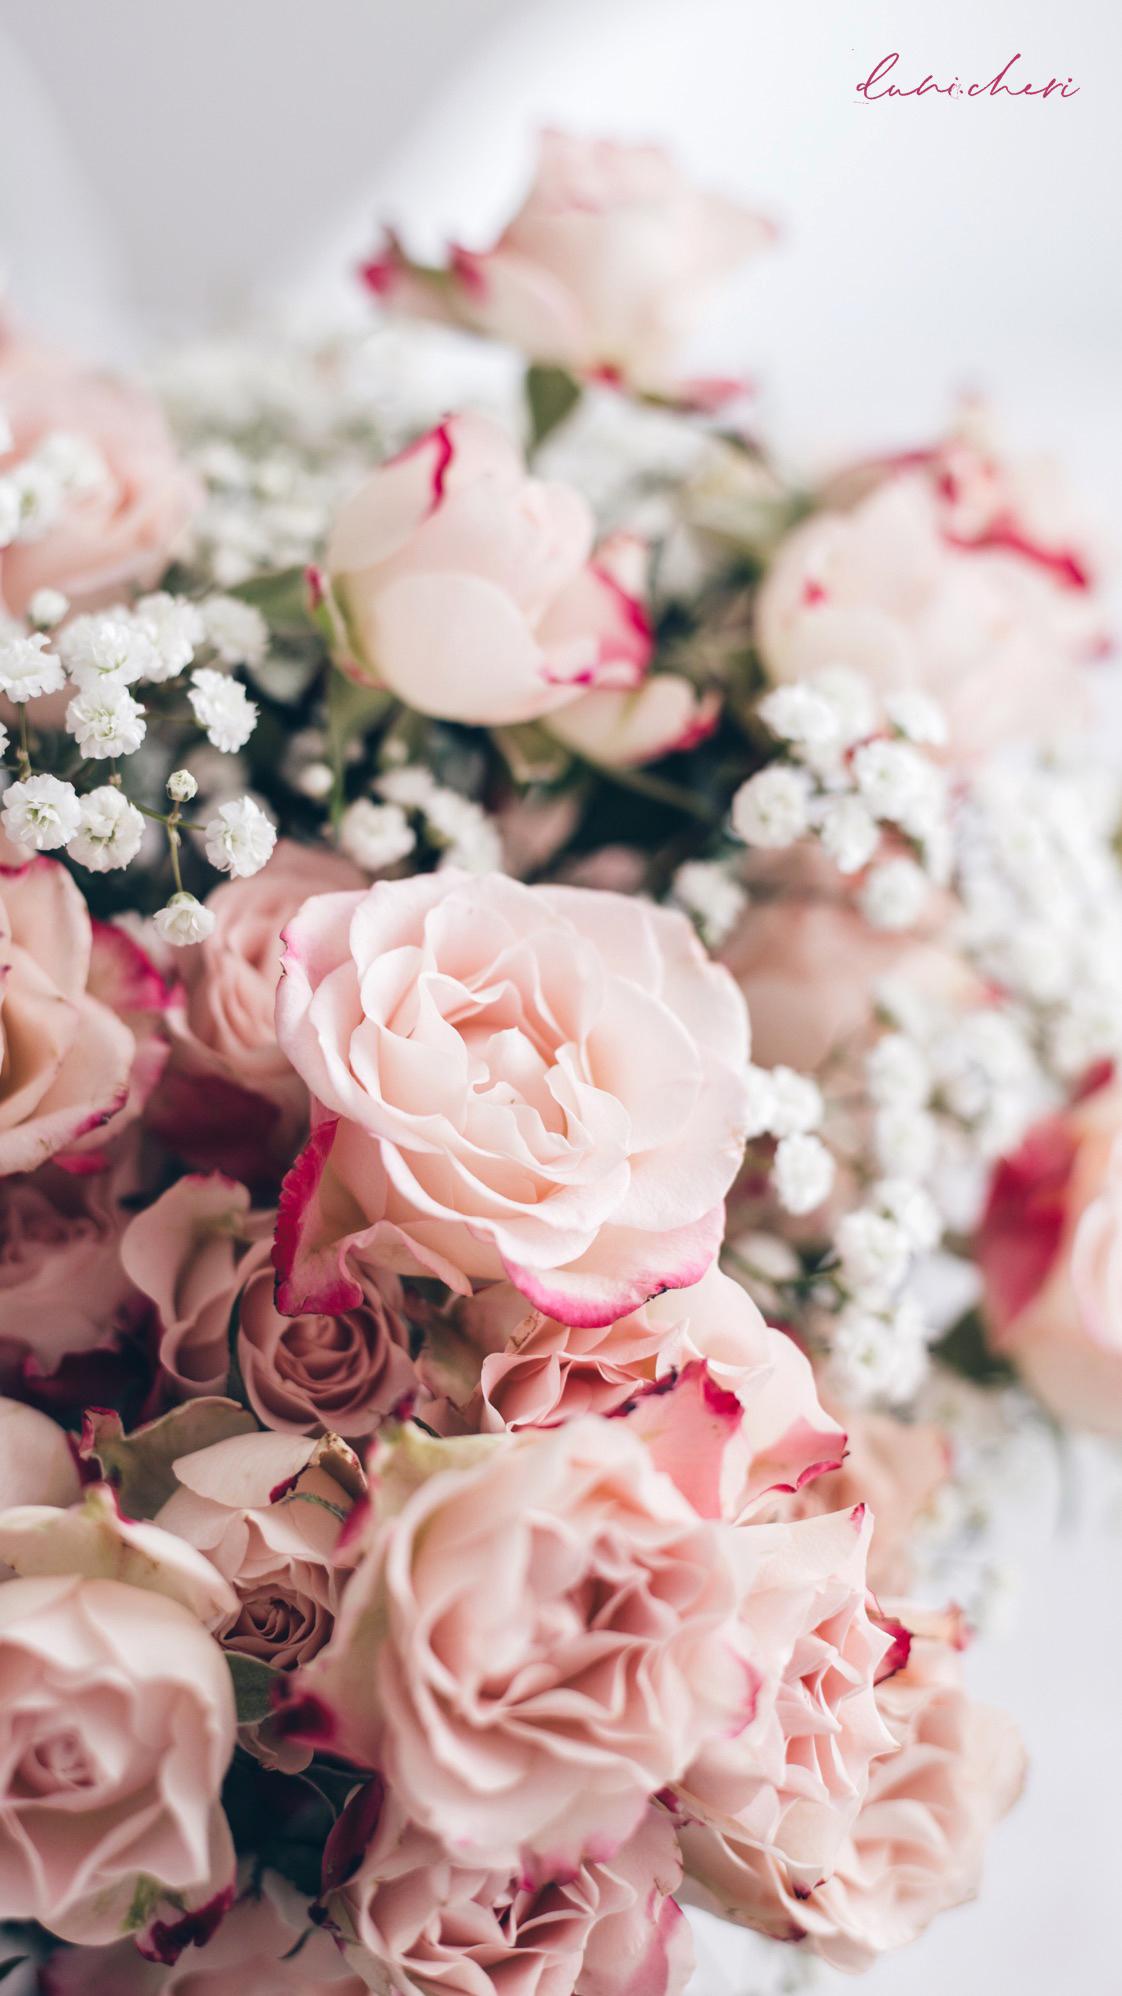 free mobil wallpaper pink flowers